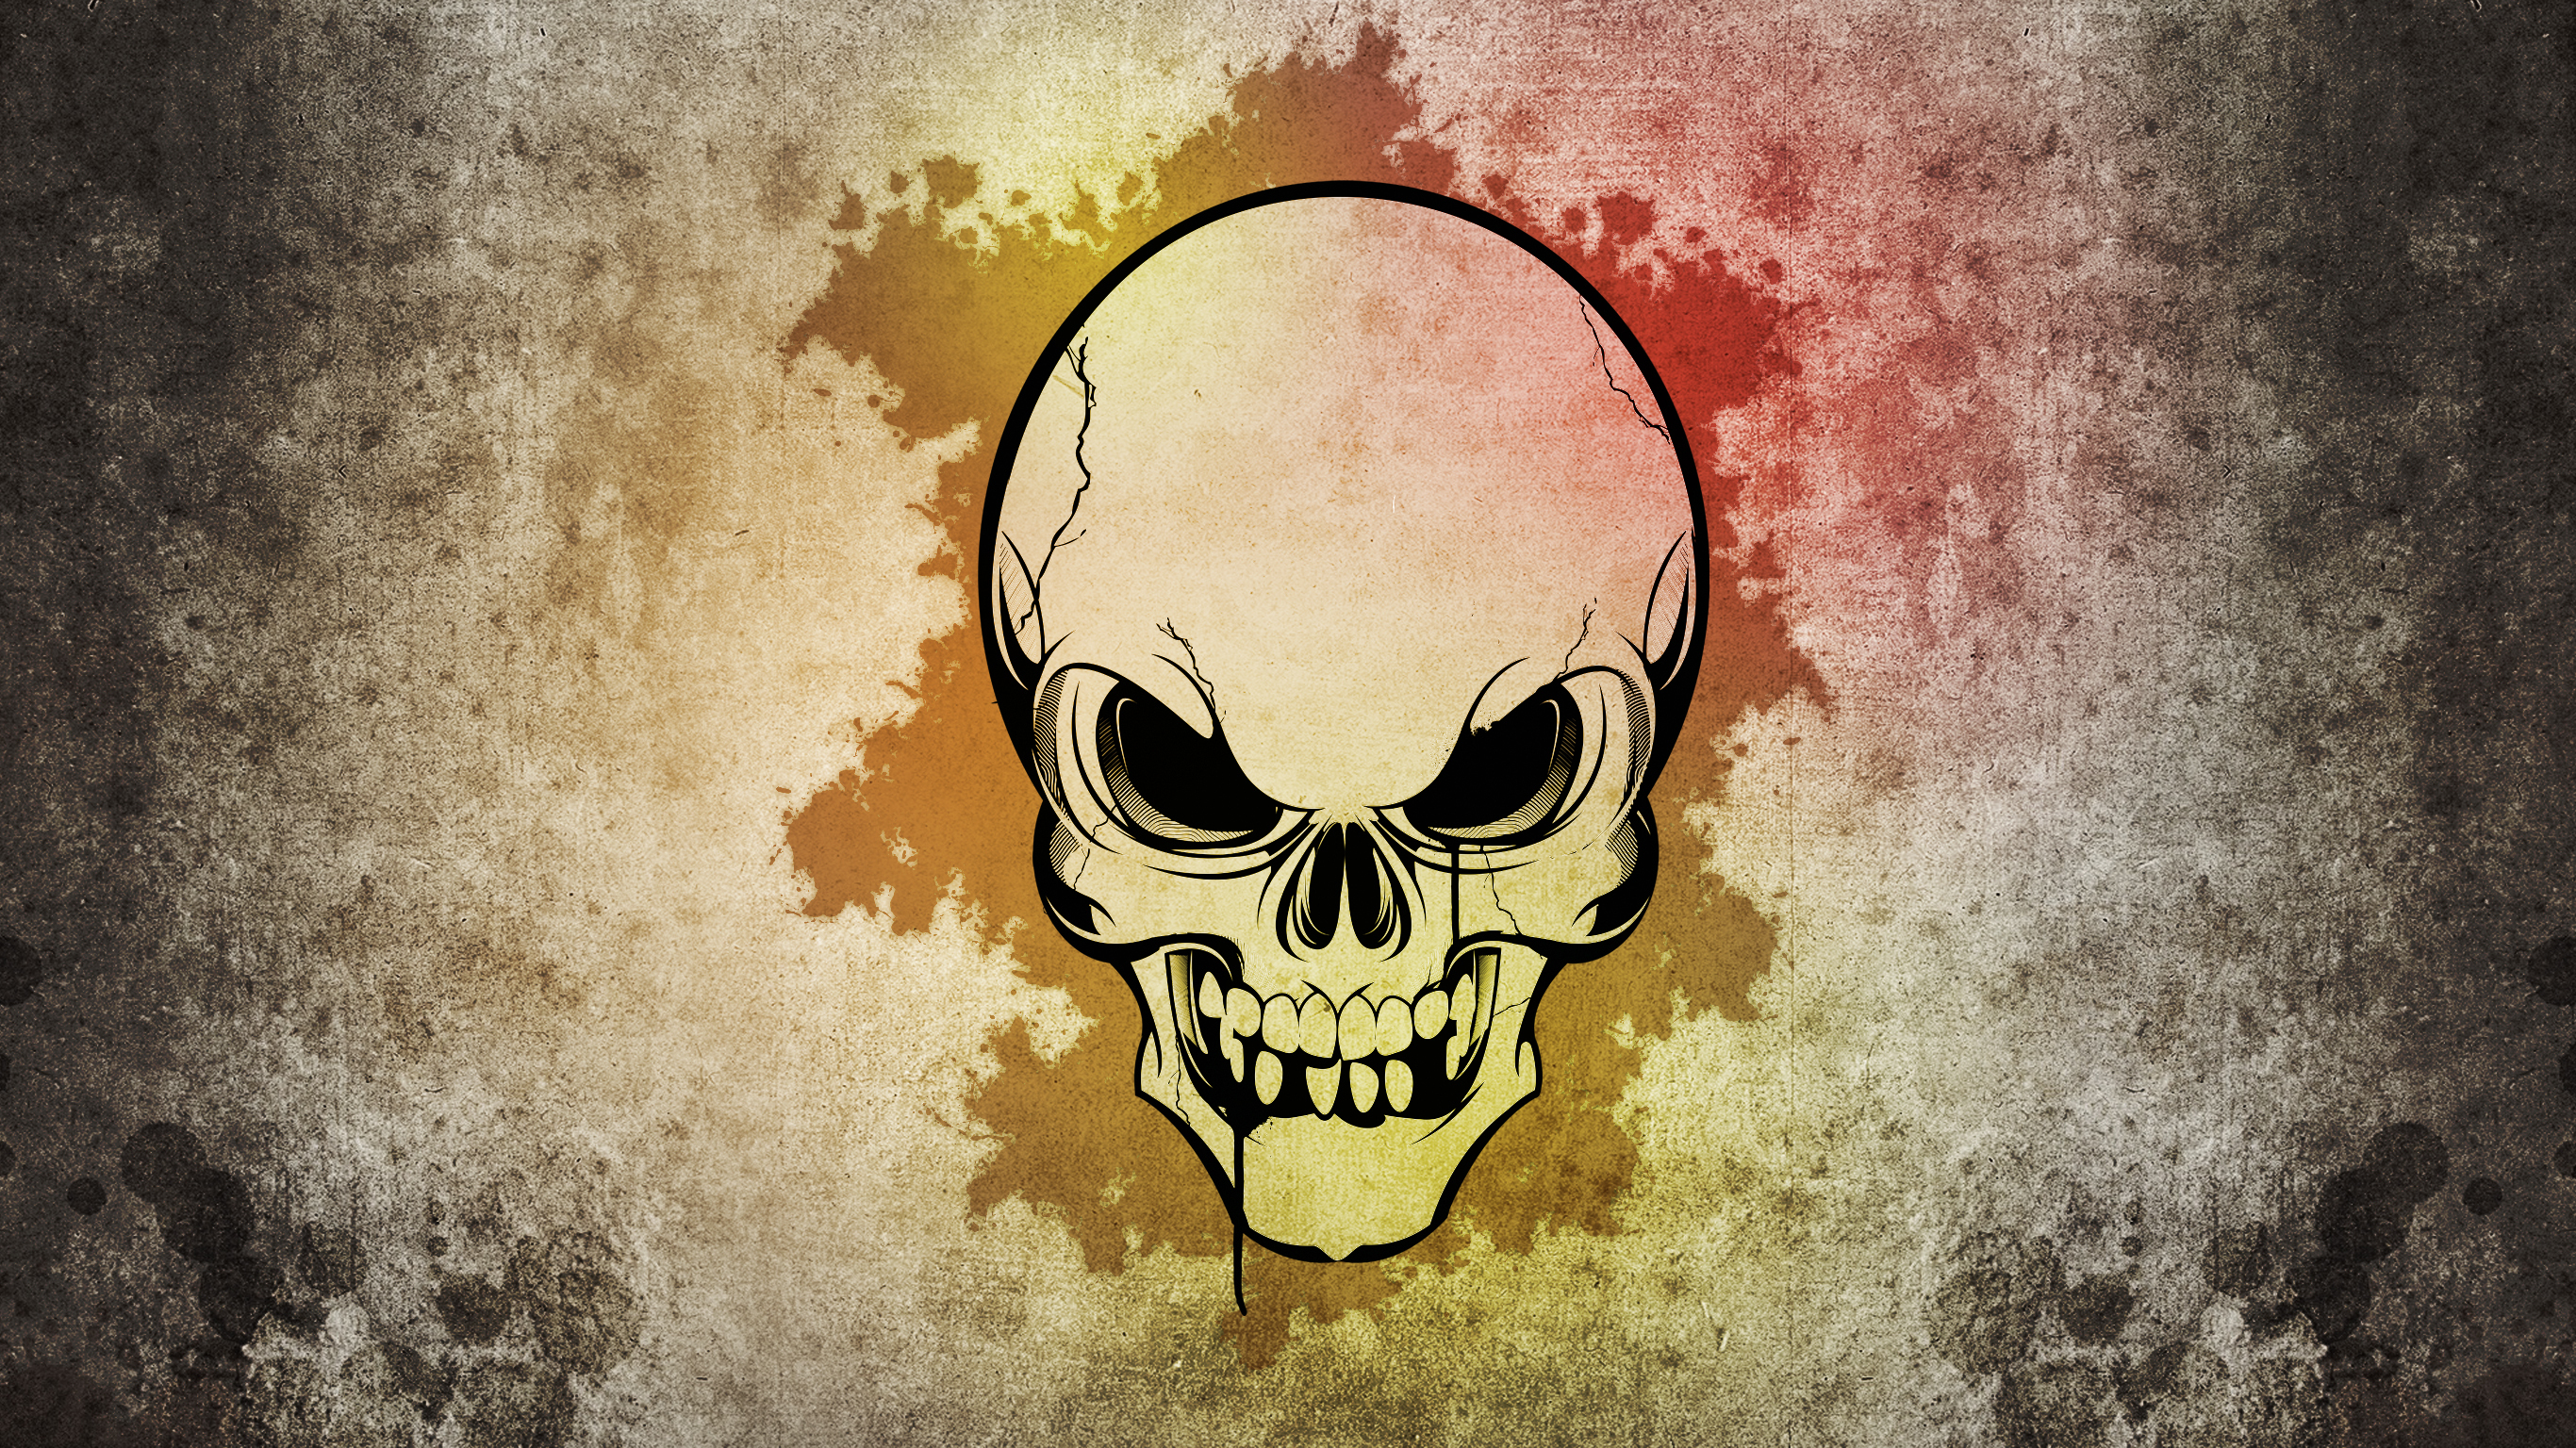 Skull Full HD Wallpaper And Background  2732x1536 ID187837